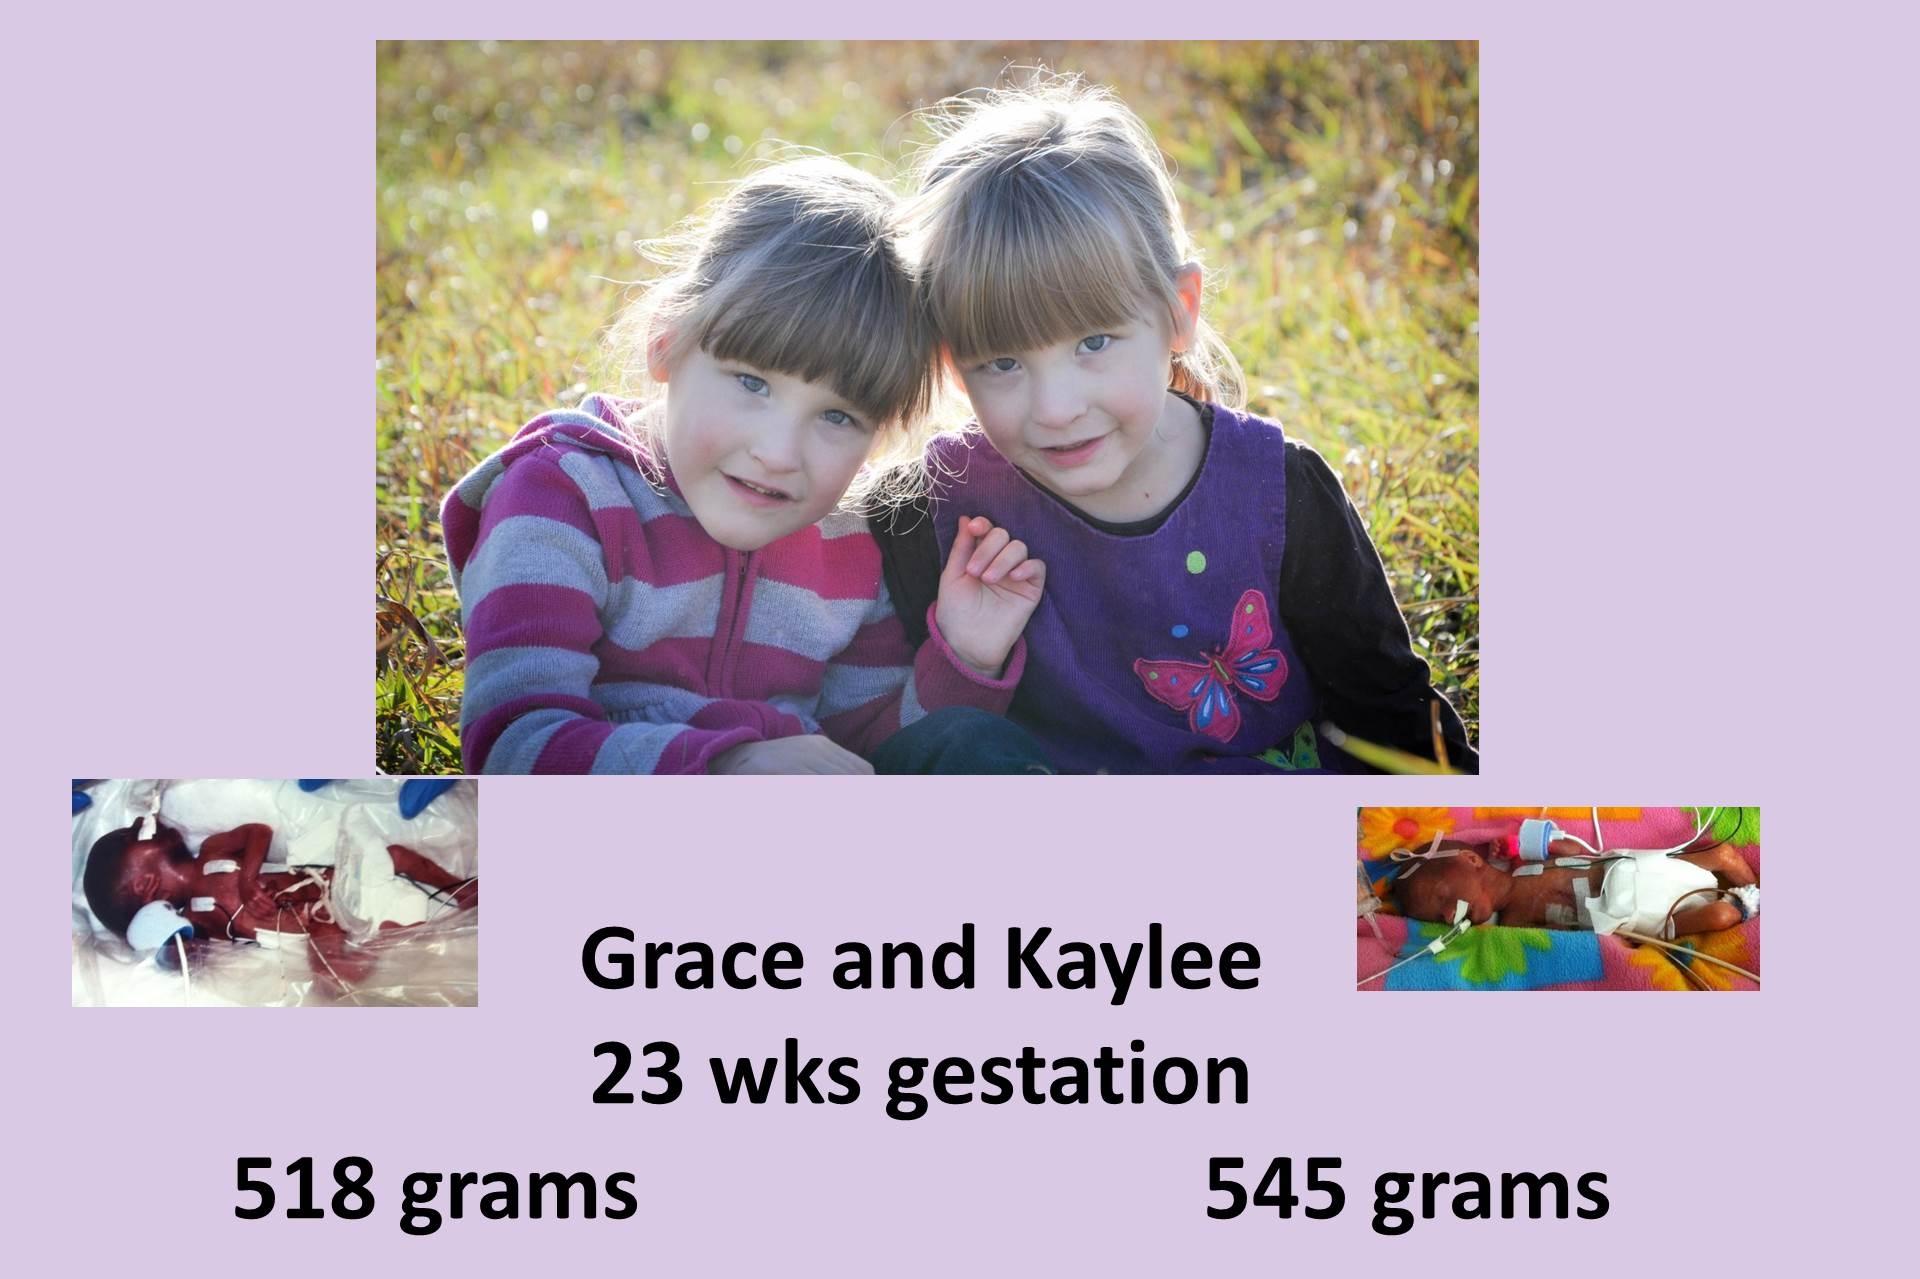 Hallway of Hope: Grace and Kaylee